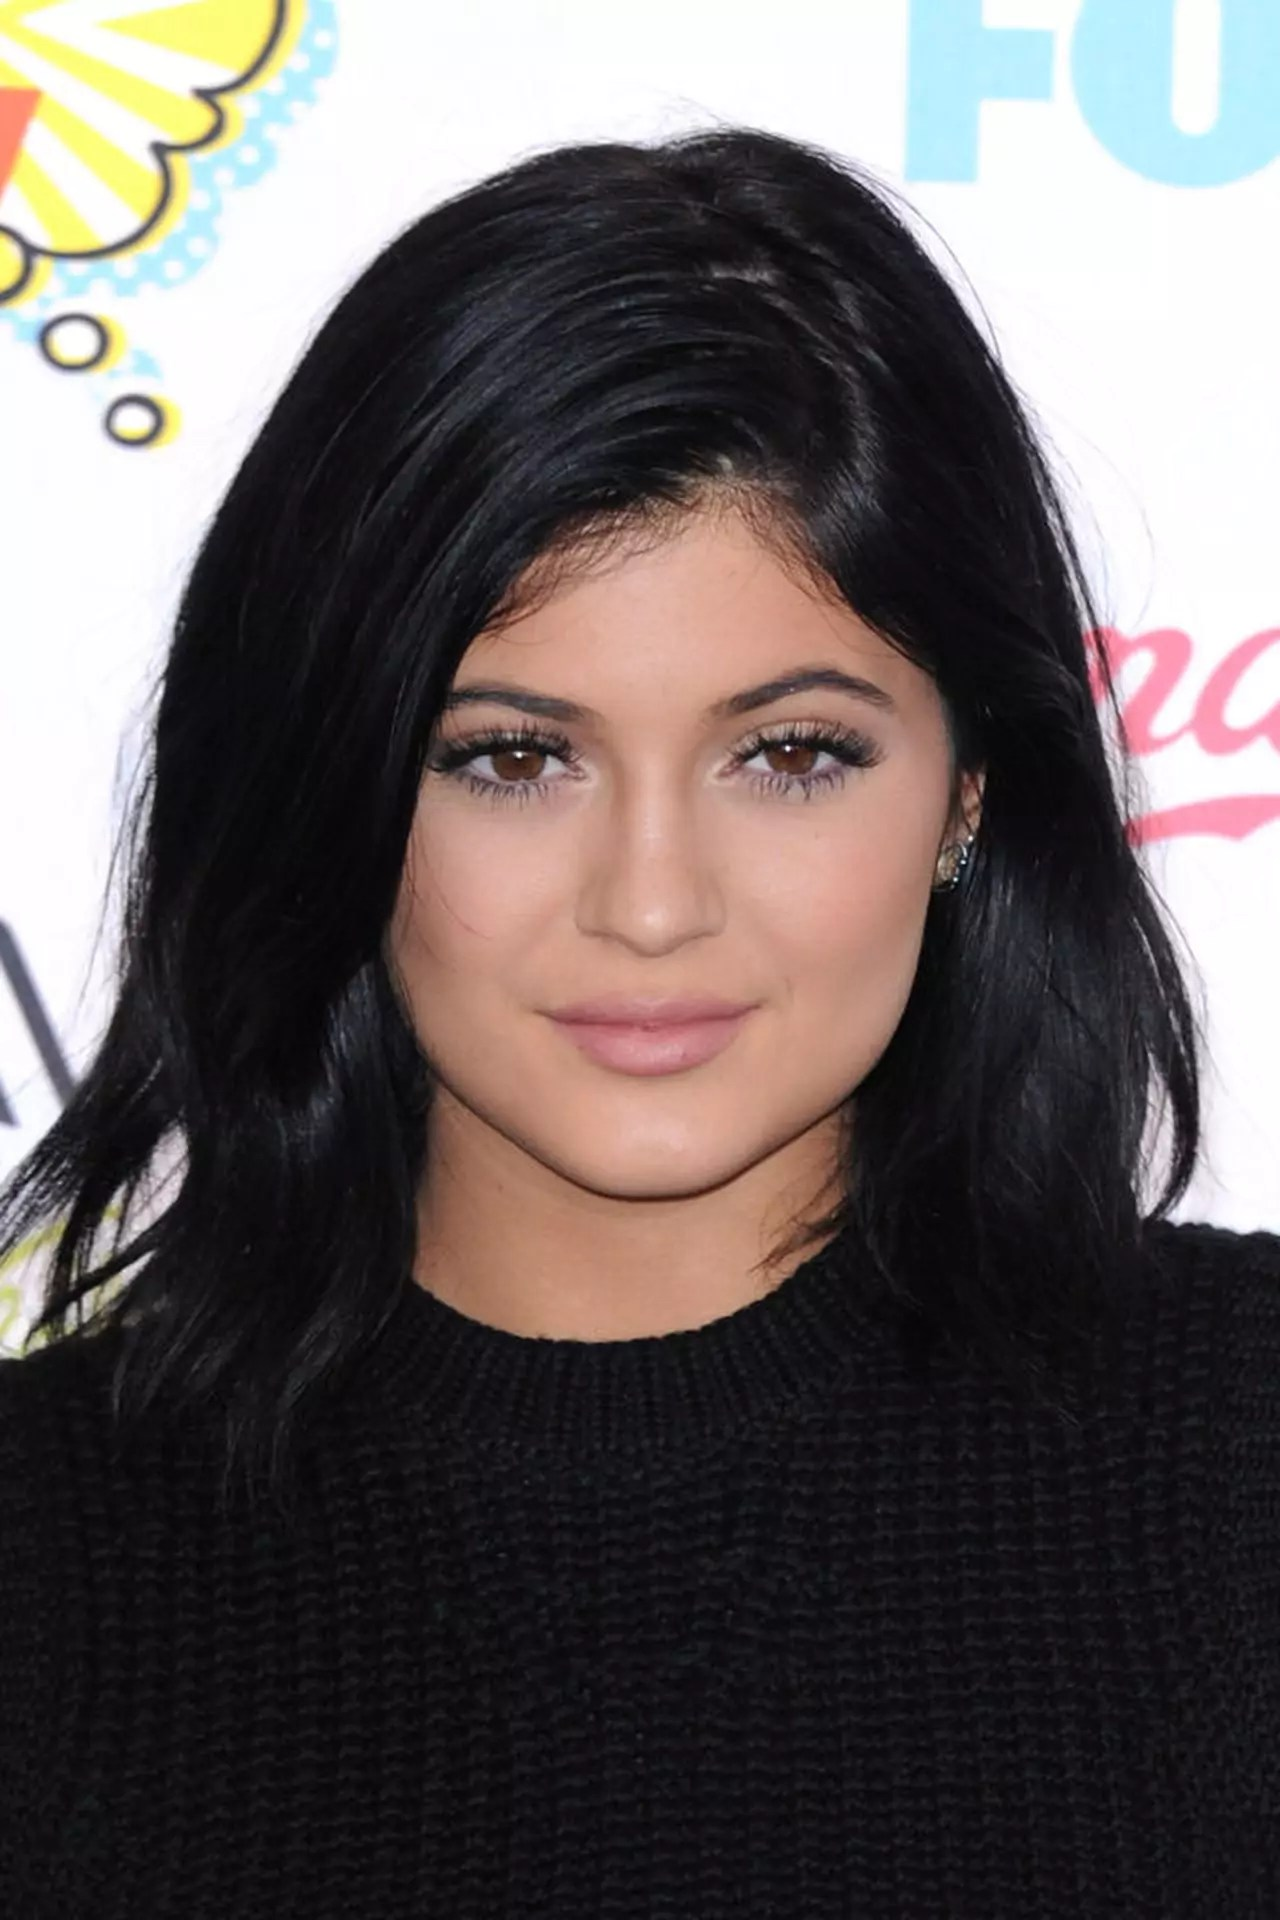 Acconciature Kylie Jenner sceglie il lob